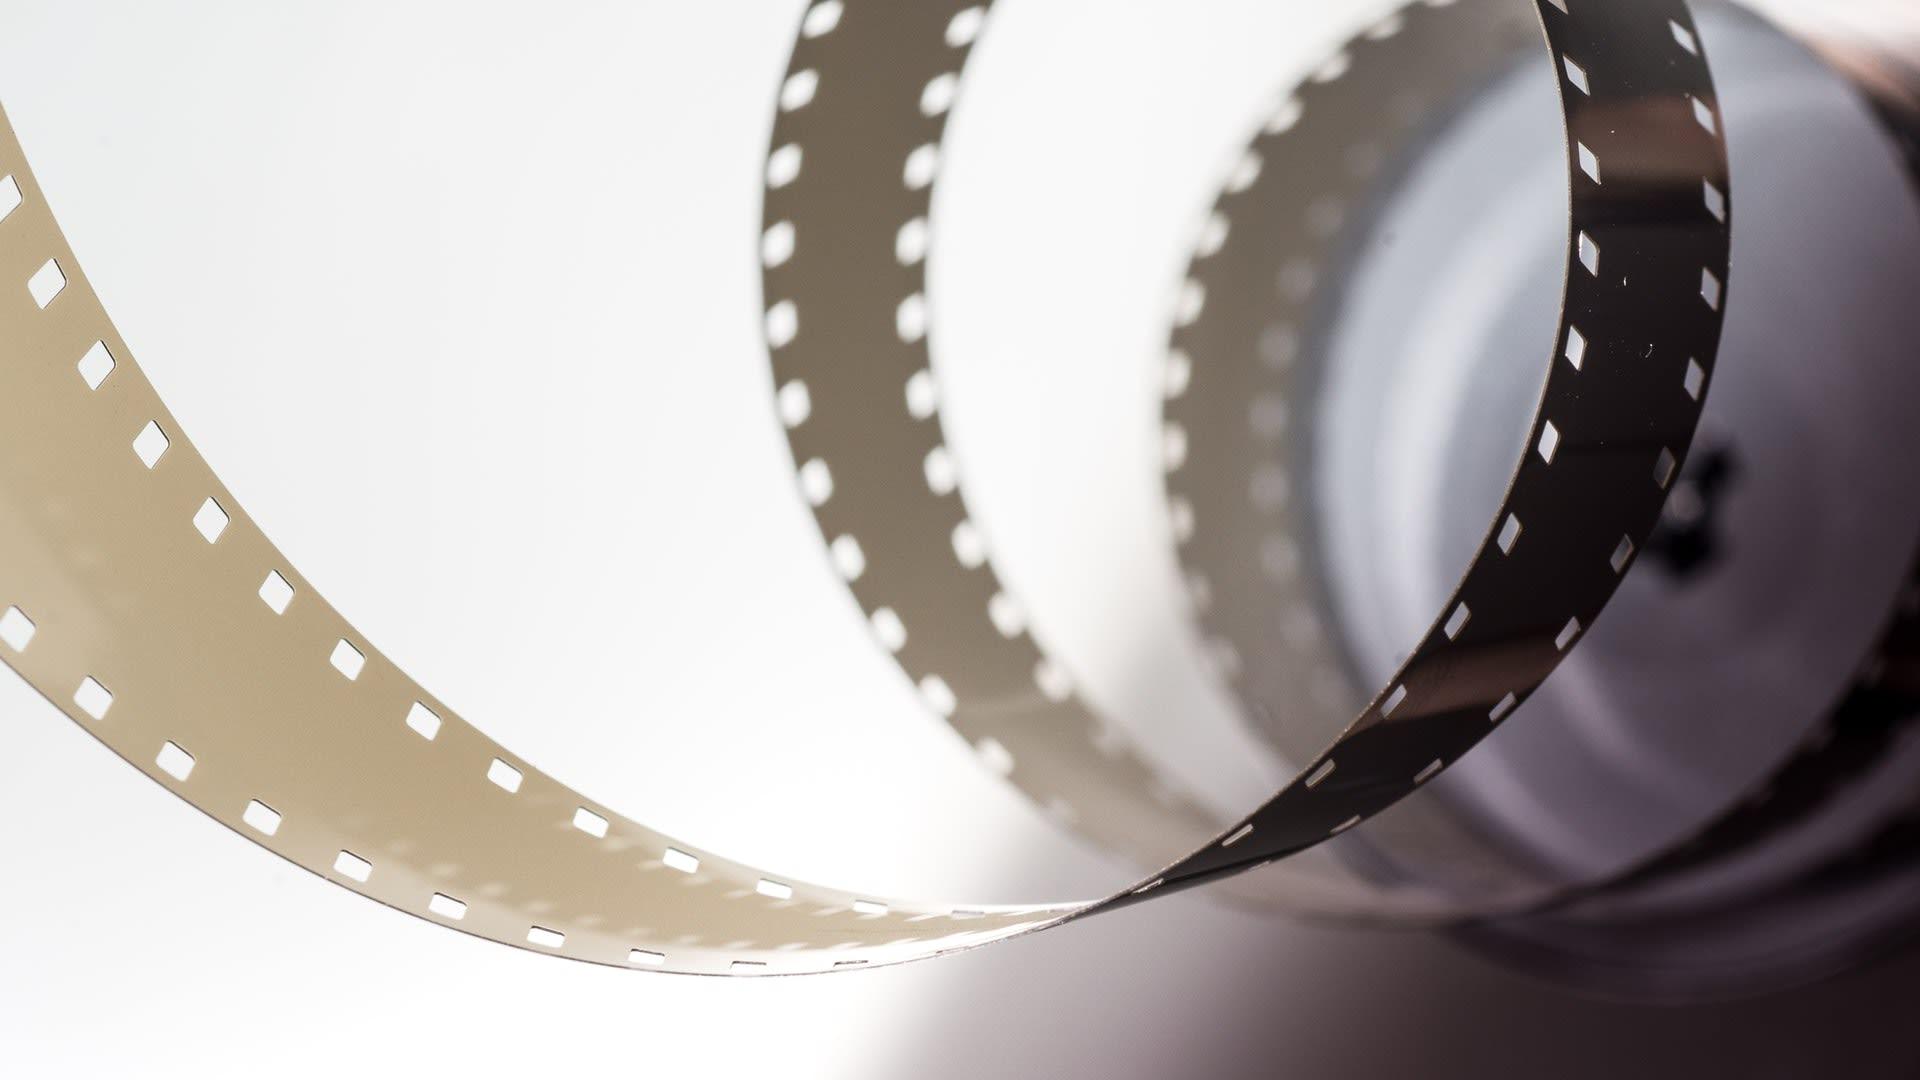 Toscana: attrici 18/26 protagoniste per un nuovo film indipendente